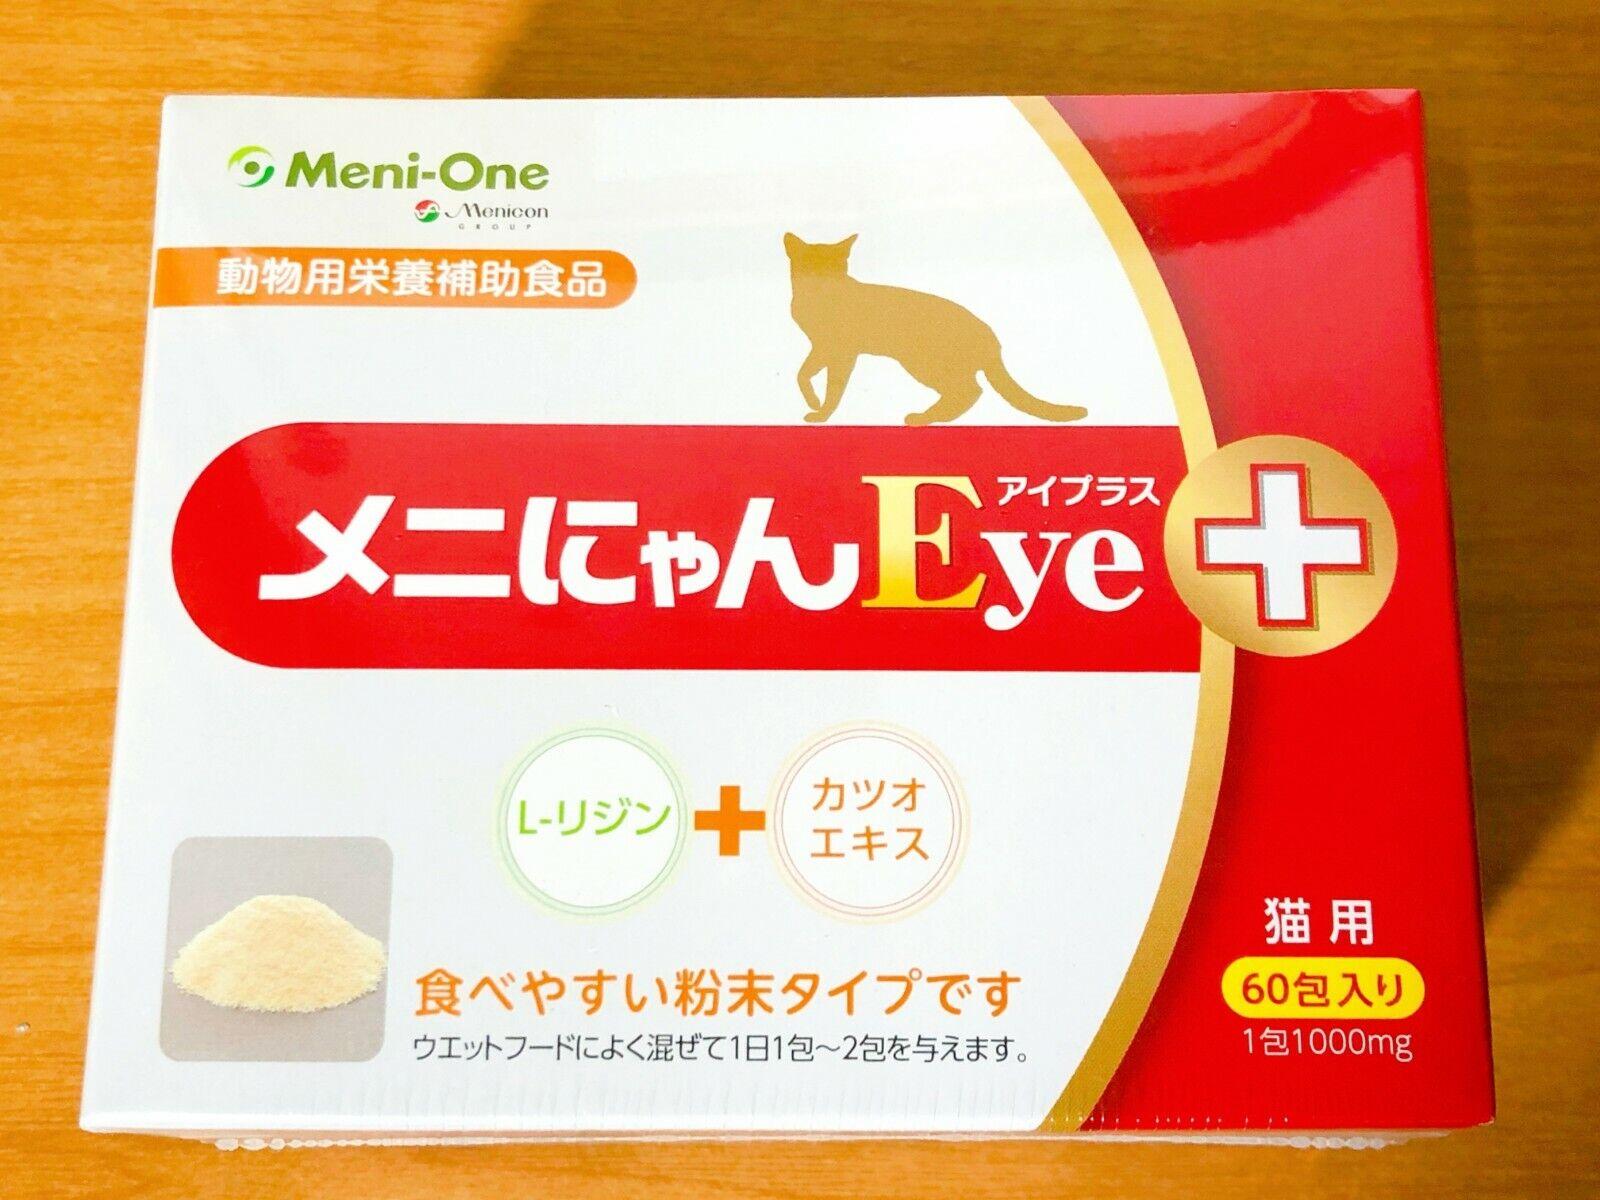 Meni Nyan Eye Plus Cats Supplement 1000mg x 60pcs Meni One Japan